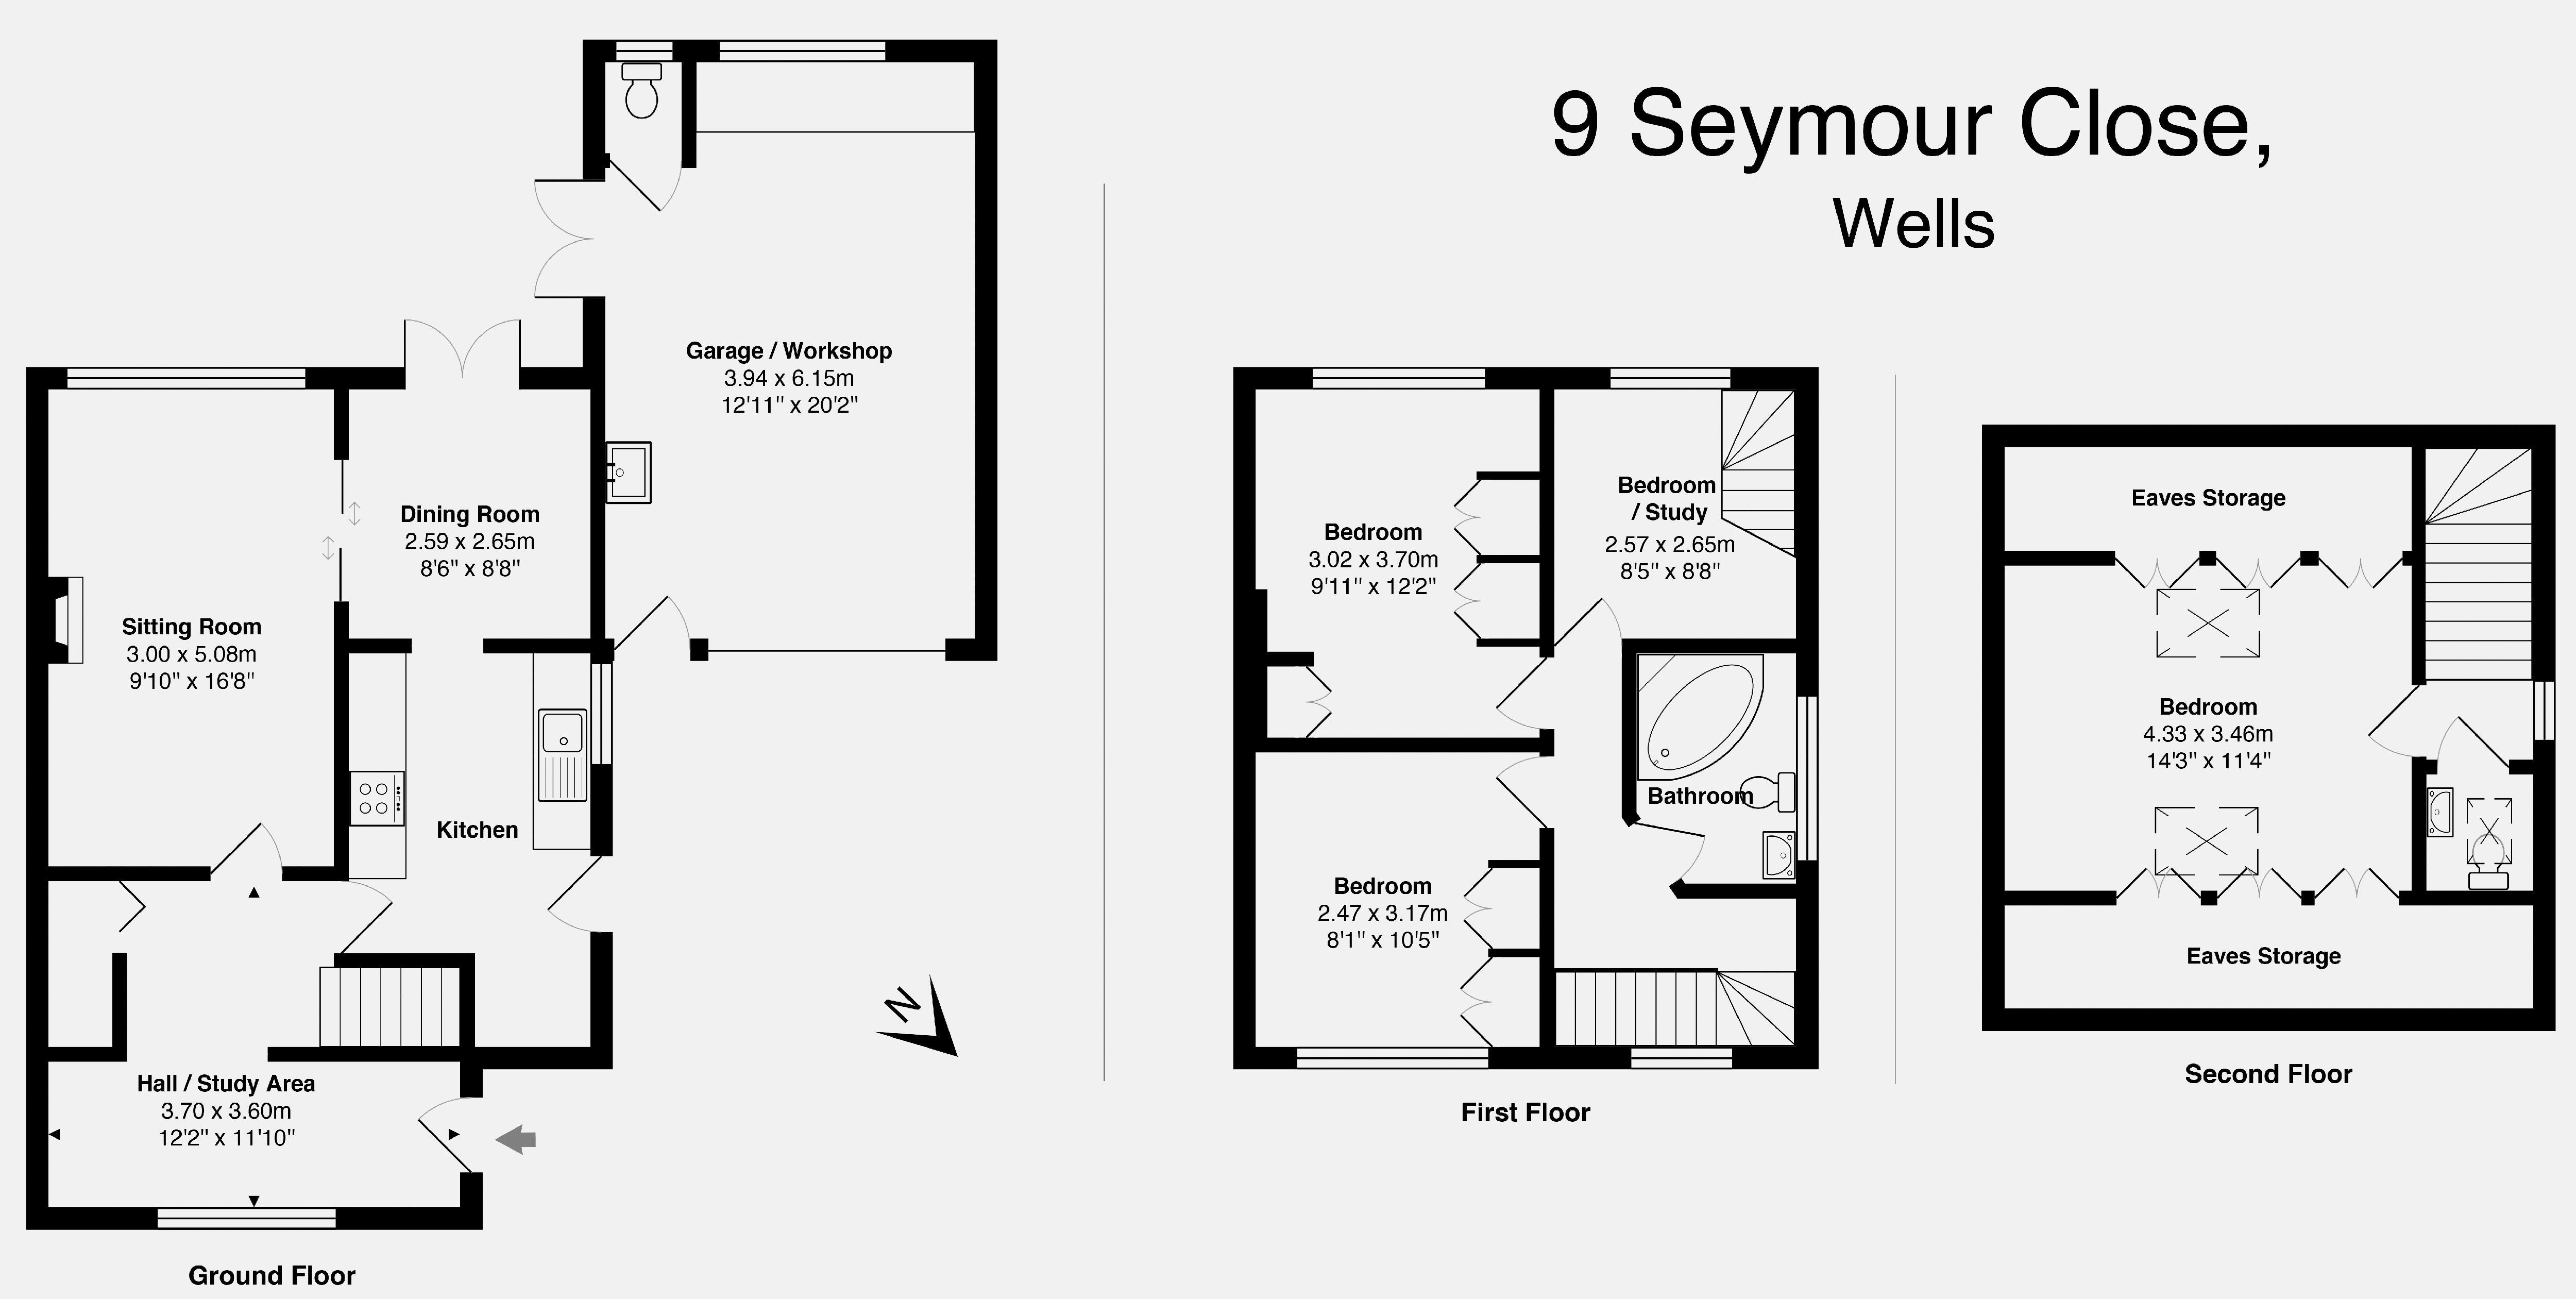 Seymour Close